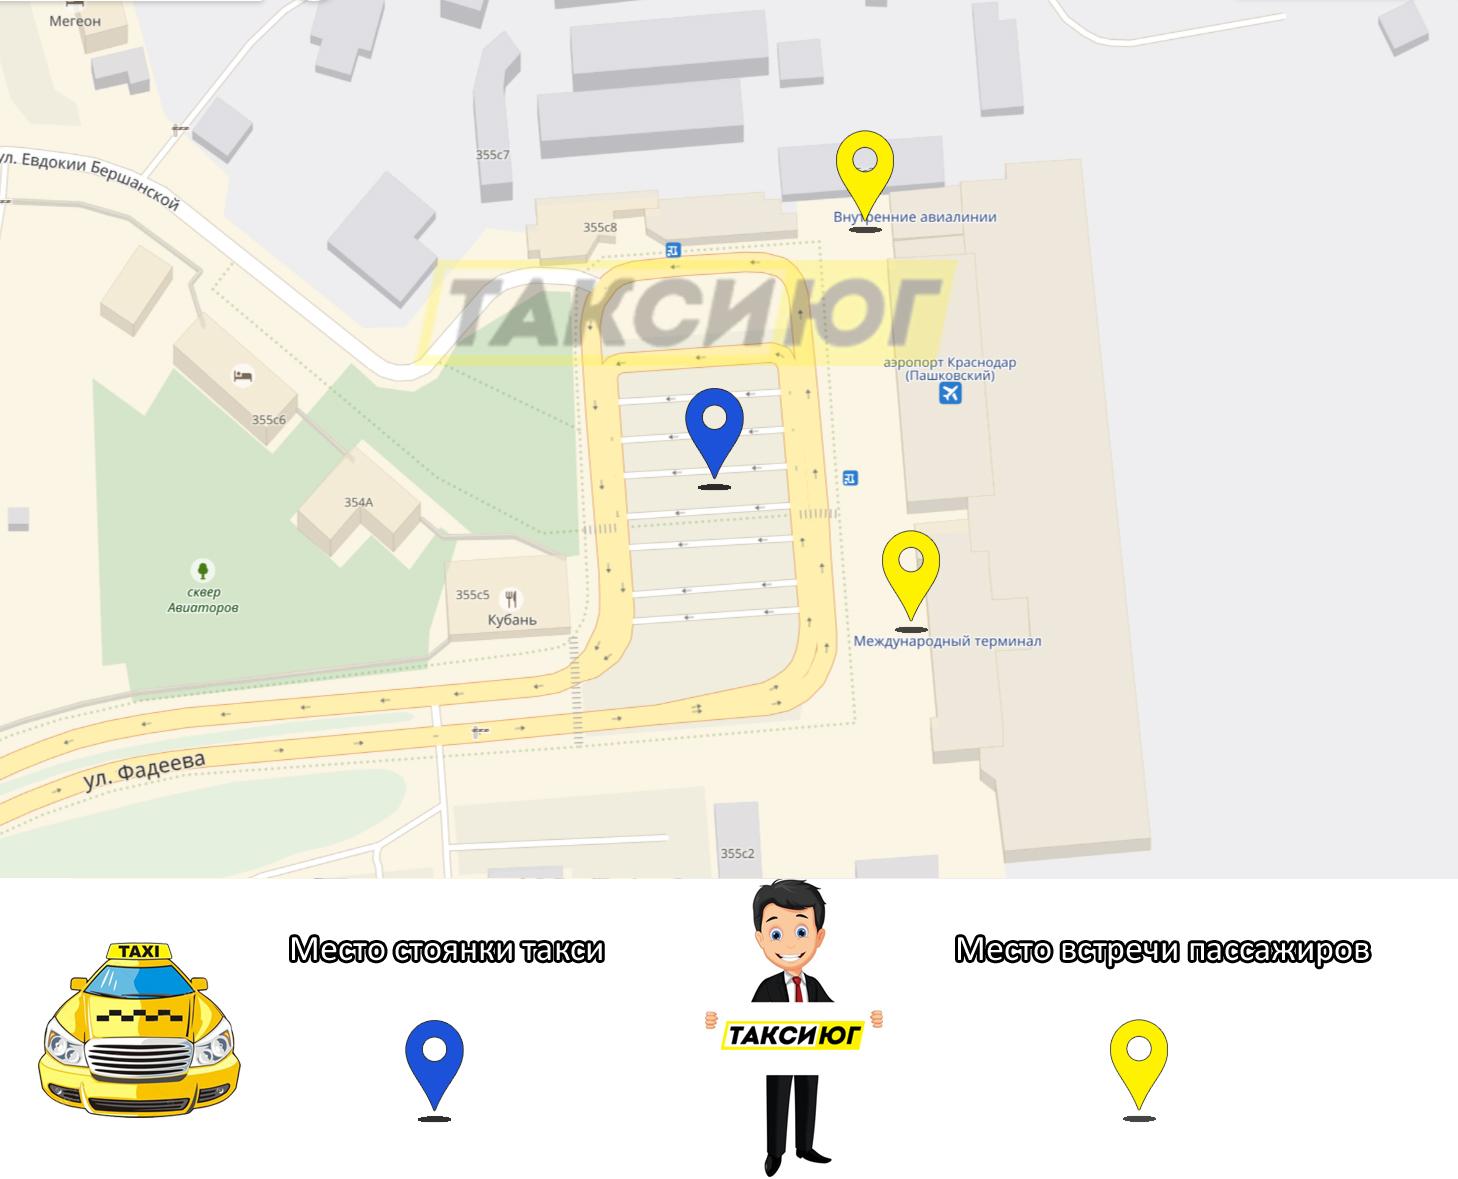 Схема речного такси